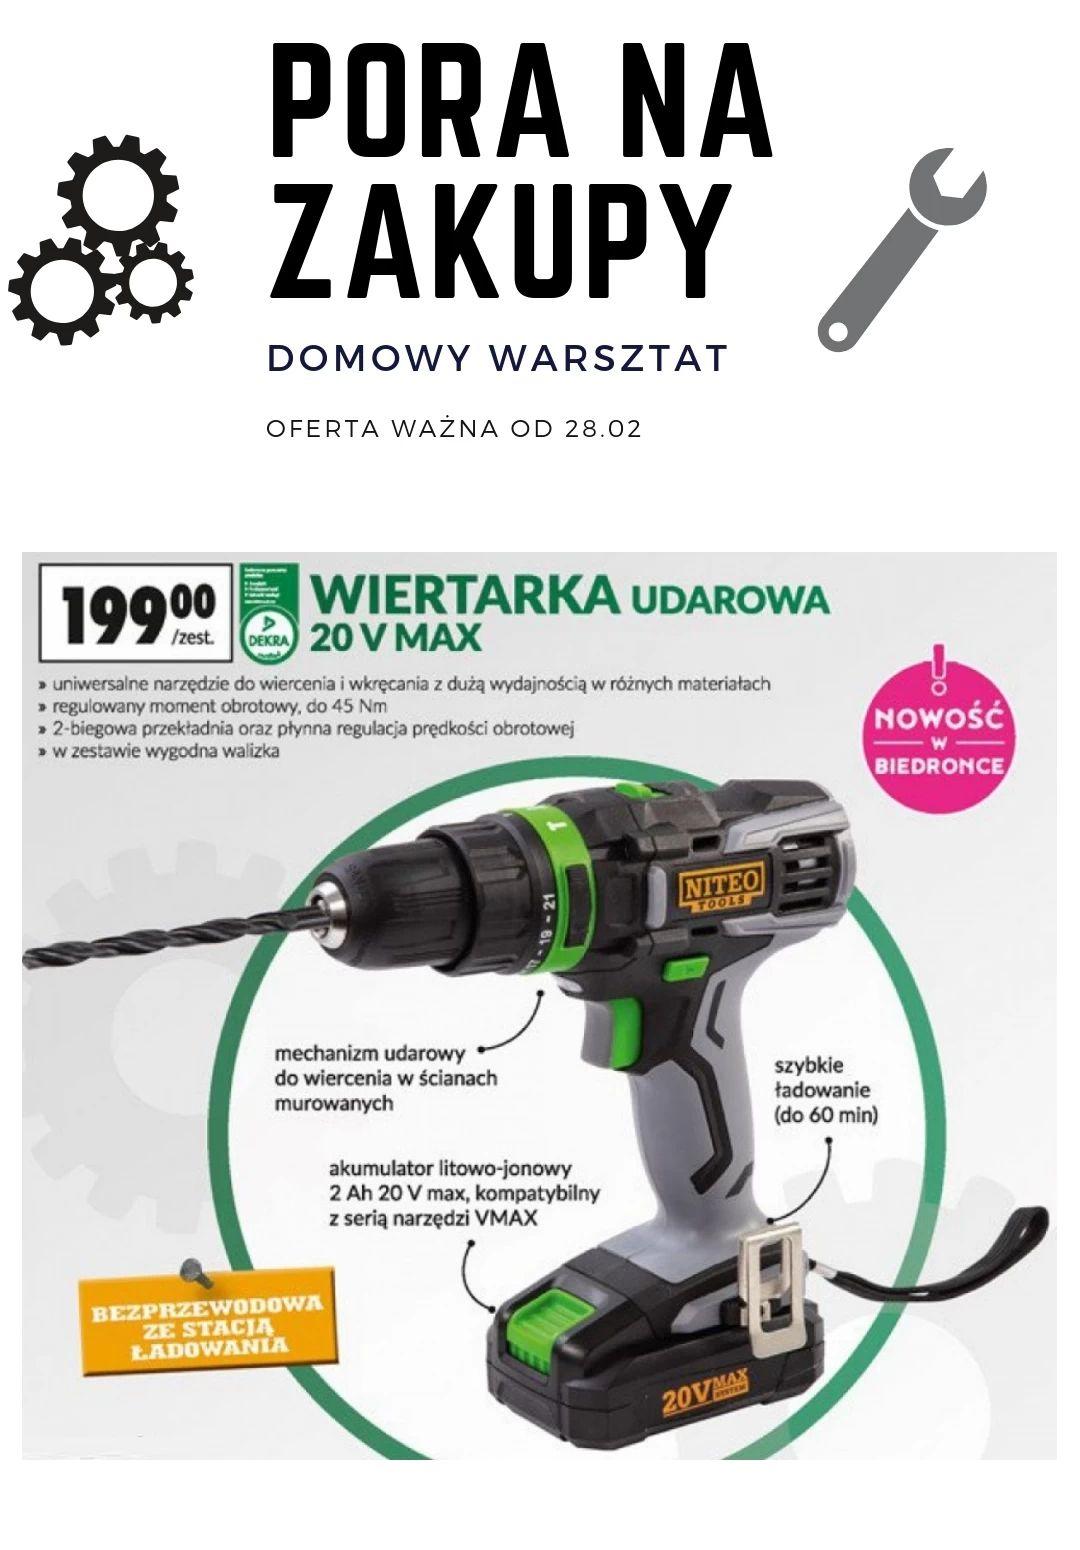 Niteo tools Wiertarko wkretarka z udarem 45Nm! @ Biedronka